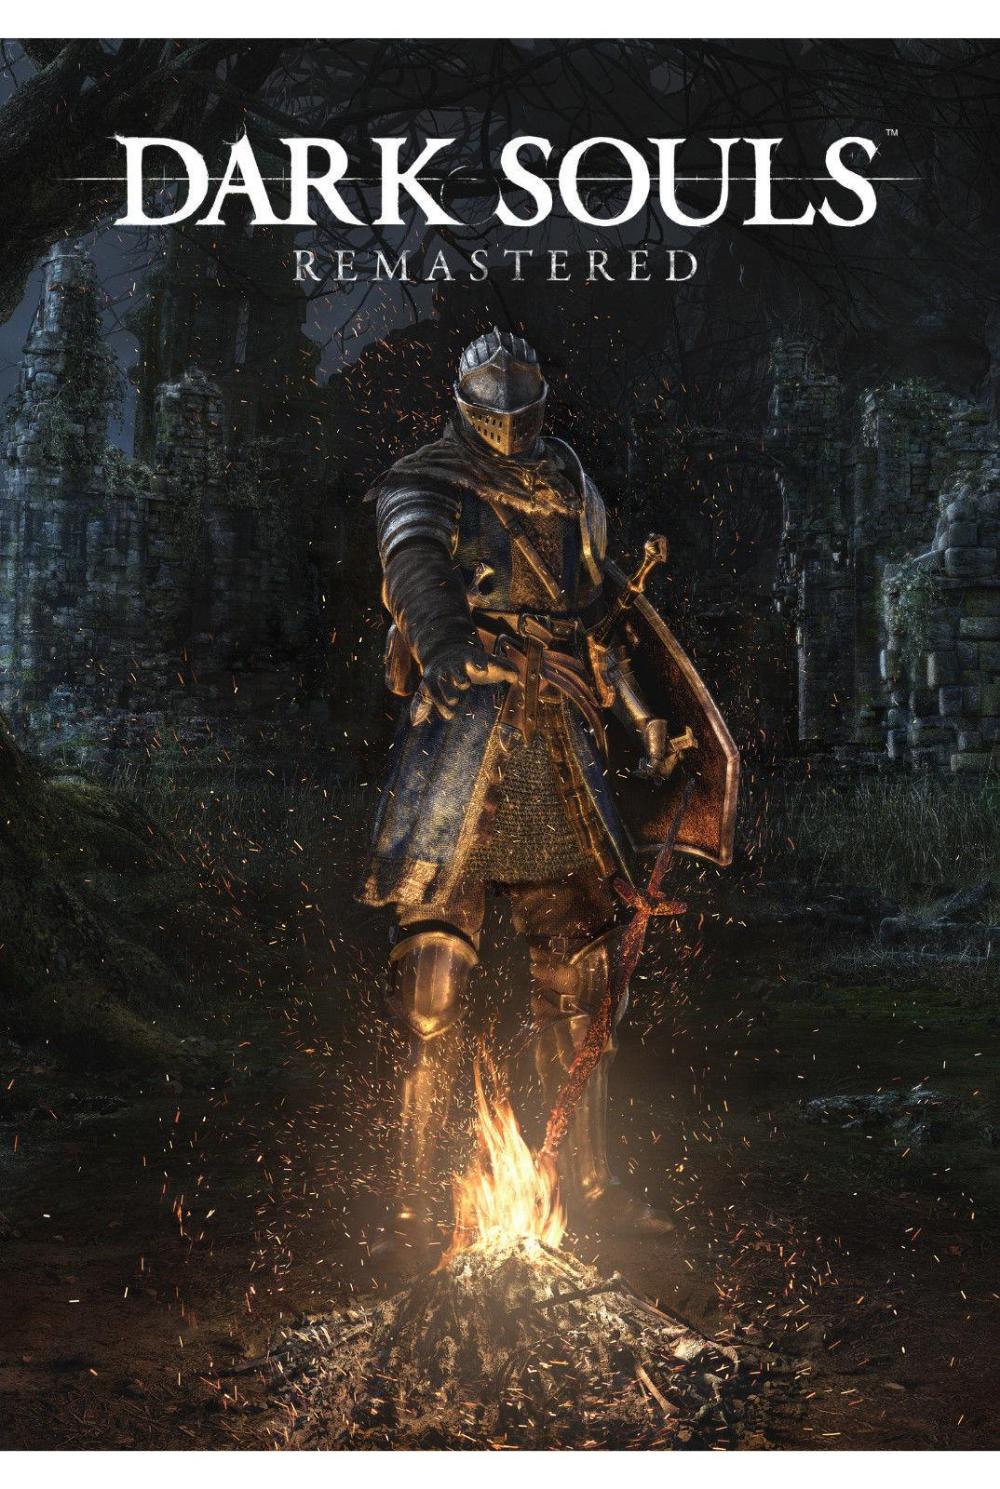 2020 Dark Souls Remastered Game Art Silk Print Poster 24x36inch60x90cm 018 From Chuy8988 10 38 Dhgate Com In 2020 Dark Souls Dark Souls Wallpaper Dark Fantasy